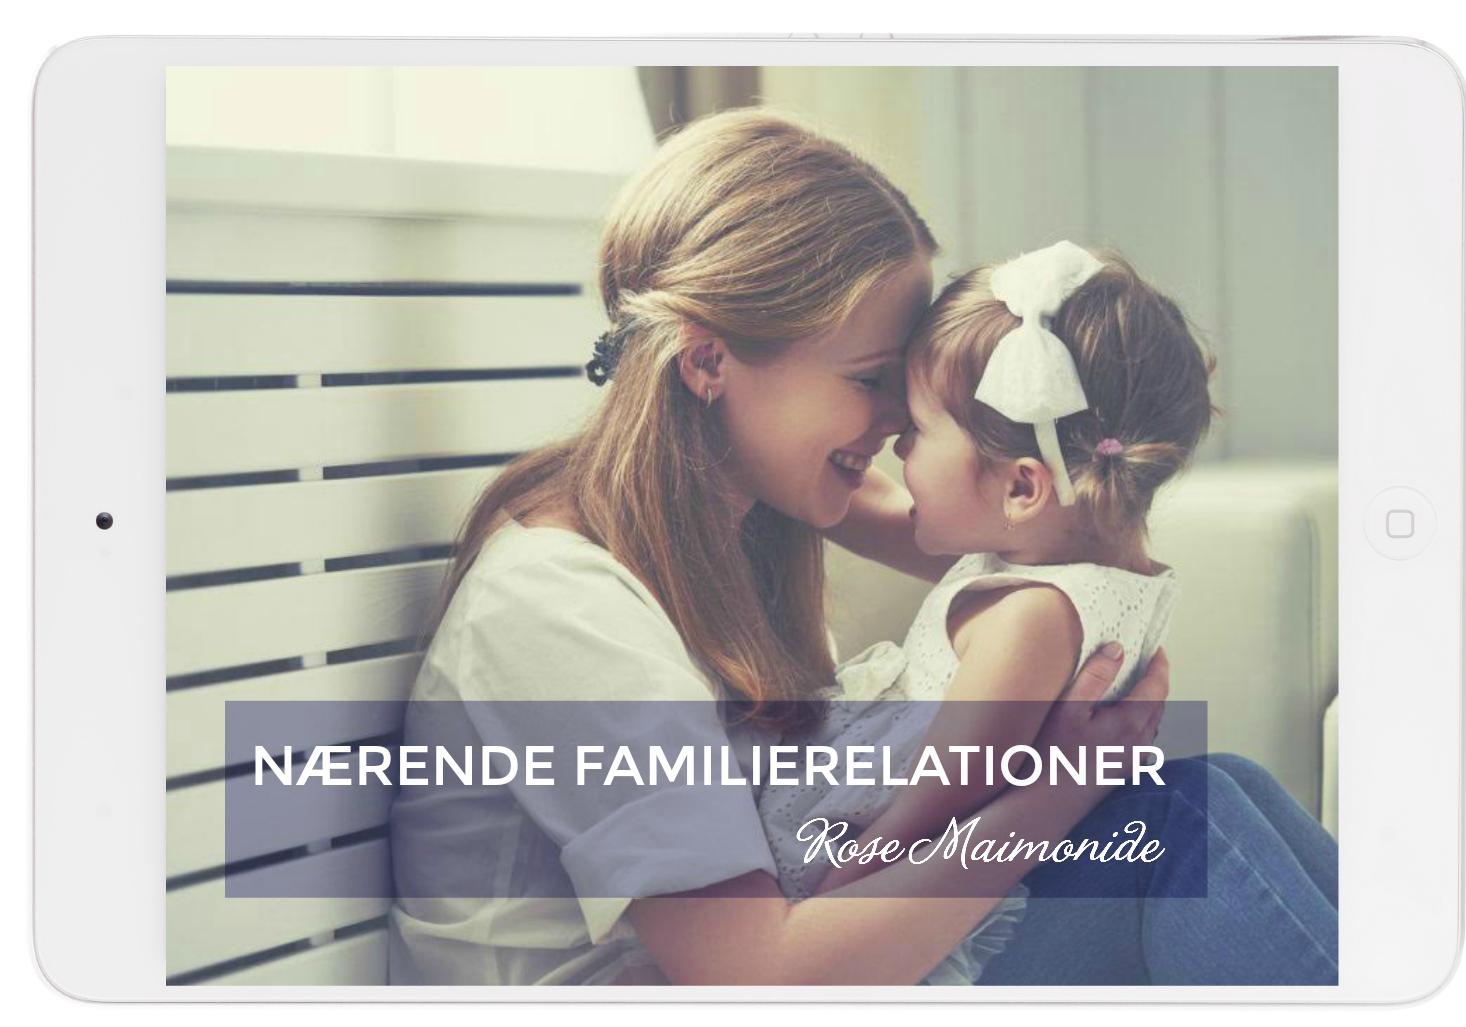 familierelationer